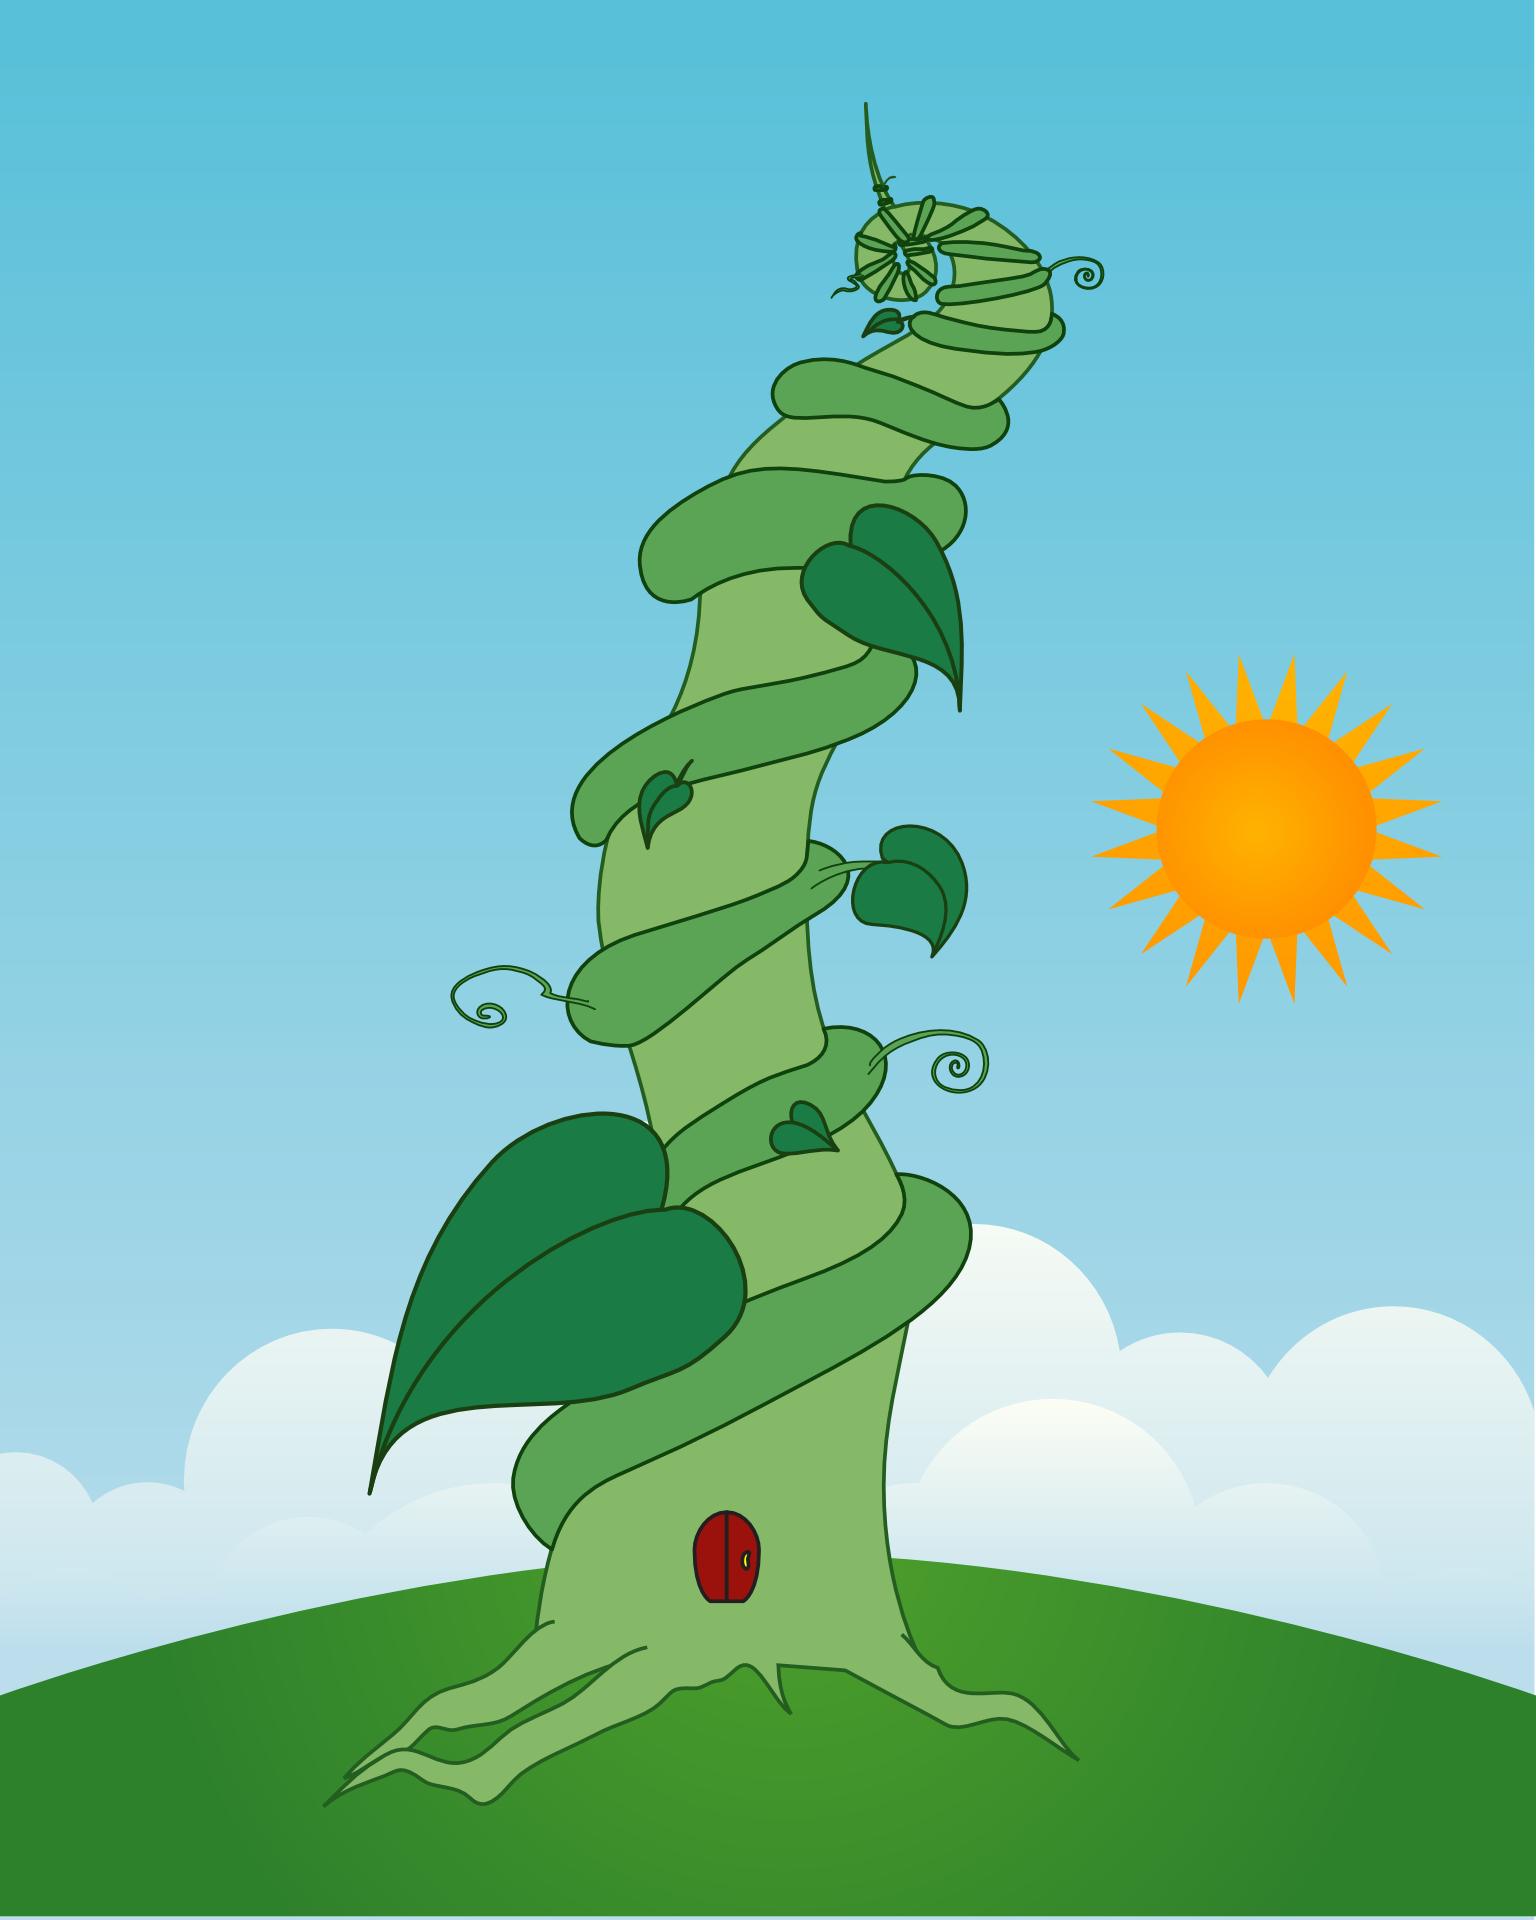 Cartoon green plant and sun cloud vector